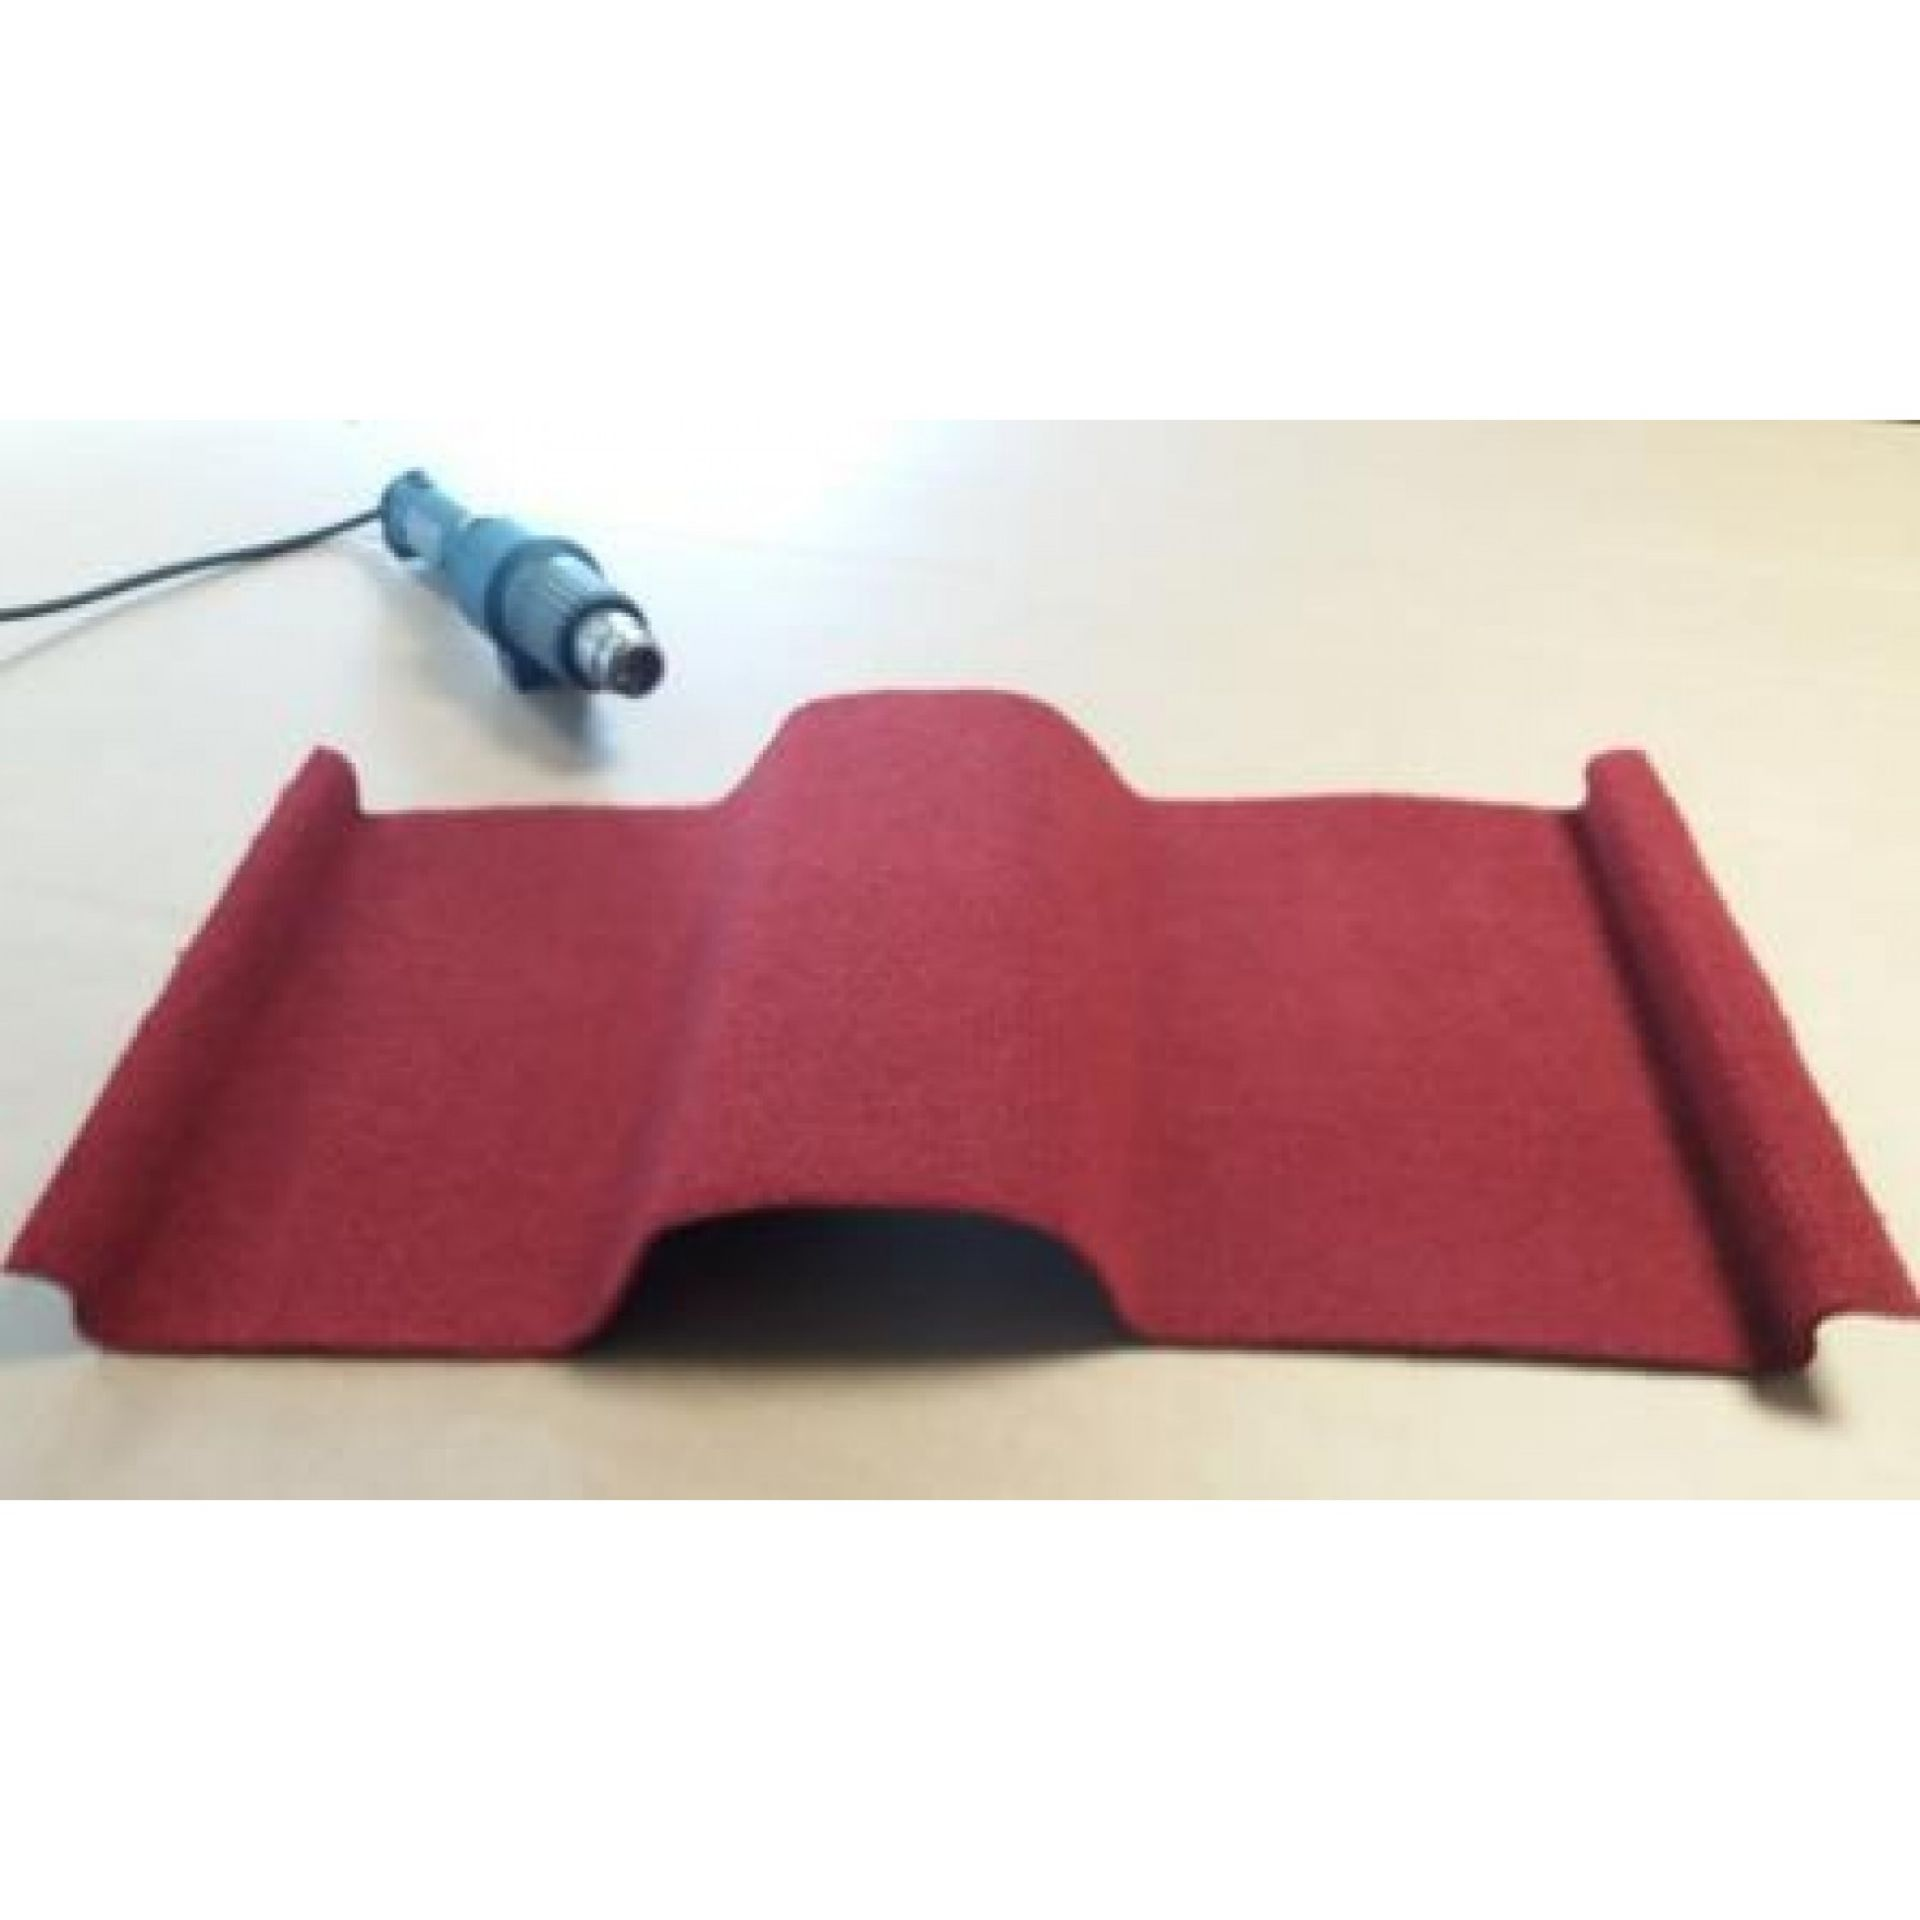 ADMS Thermo - Teppich schwarz ca. 4-5mm stark